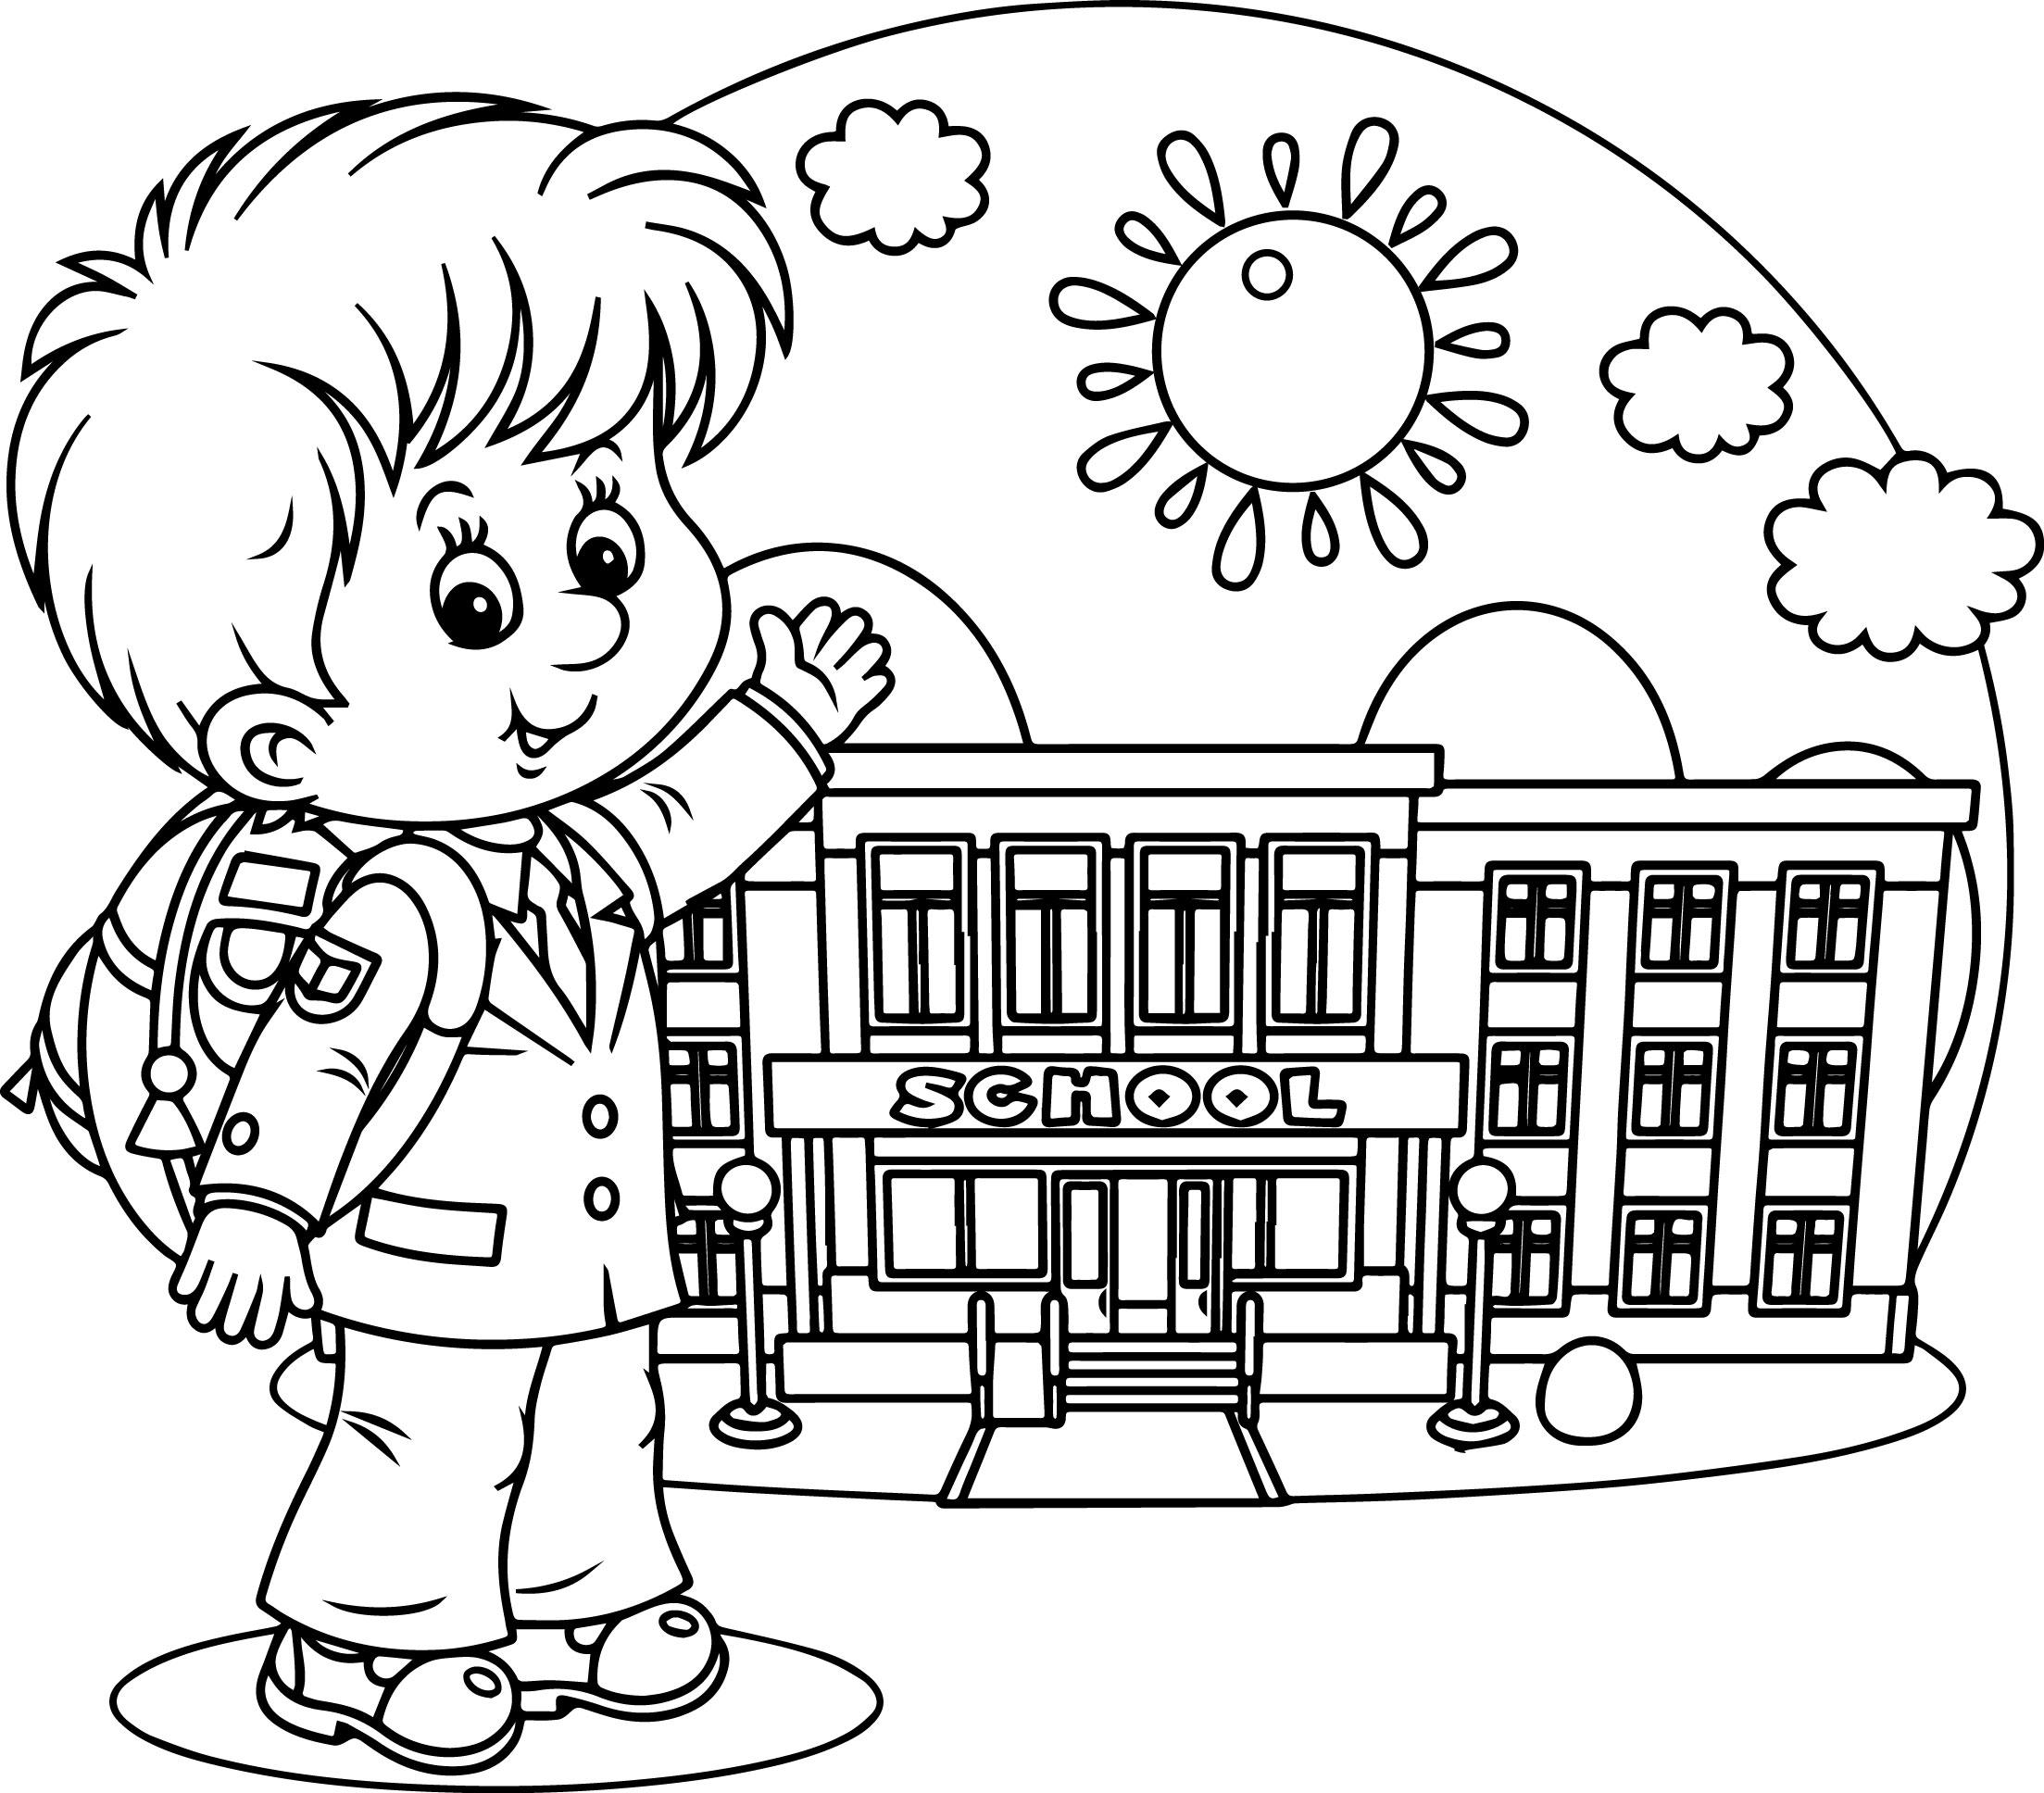 School Drawing For Kids At Getdrawings